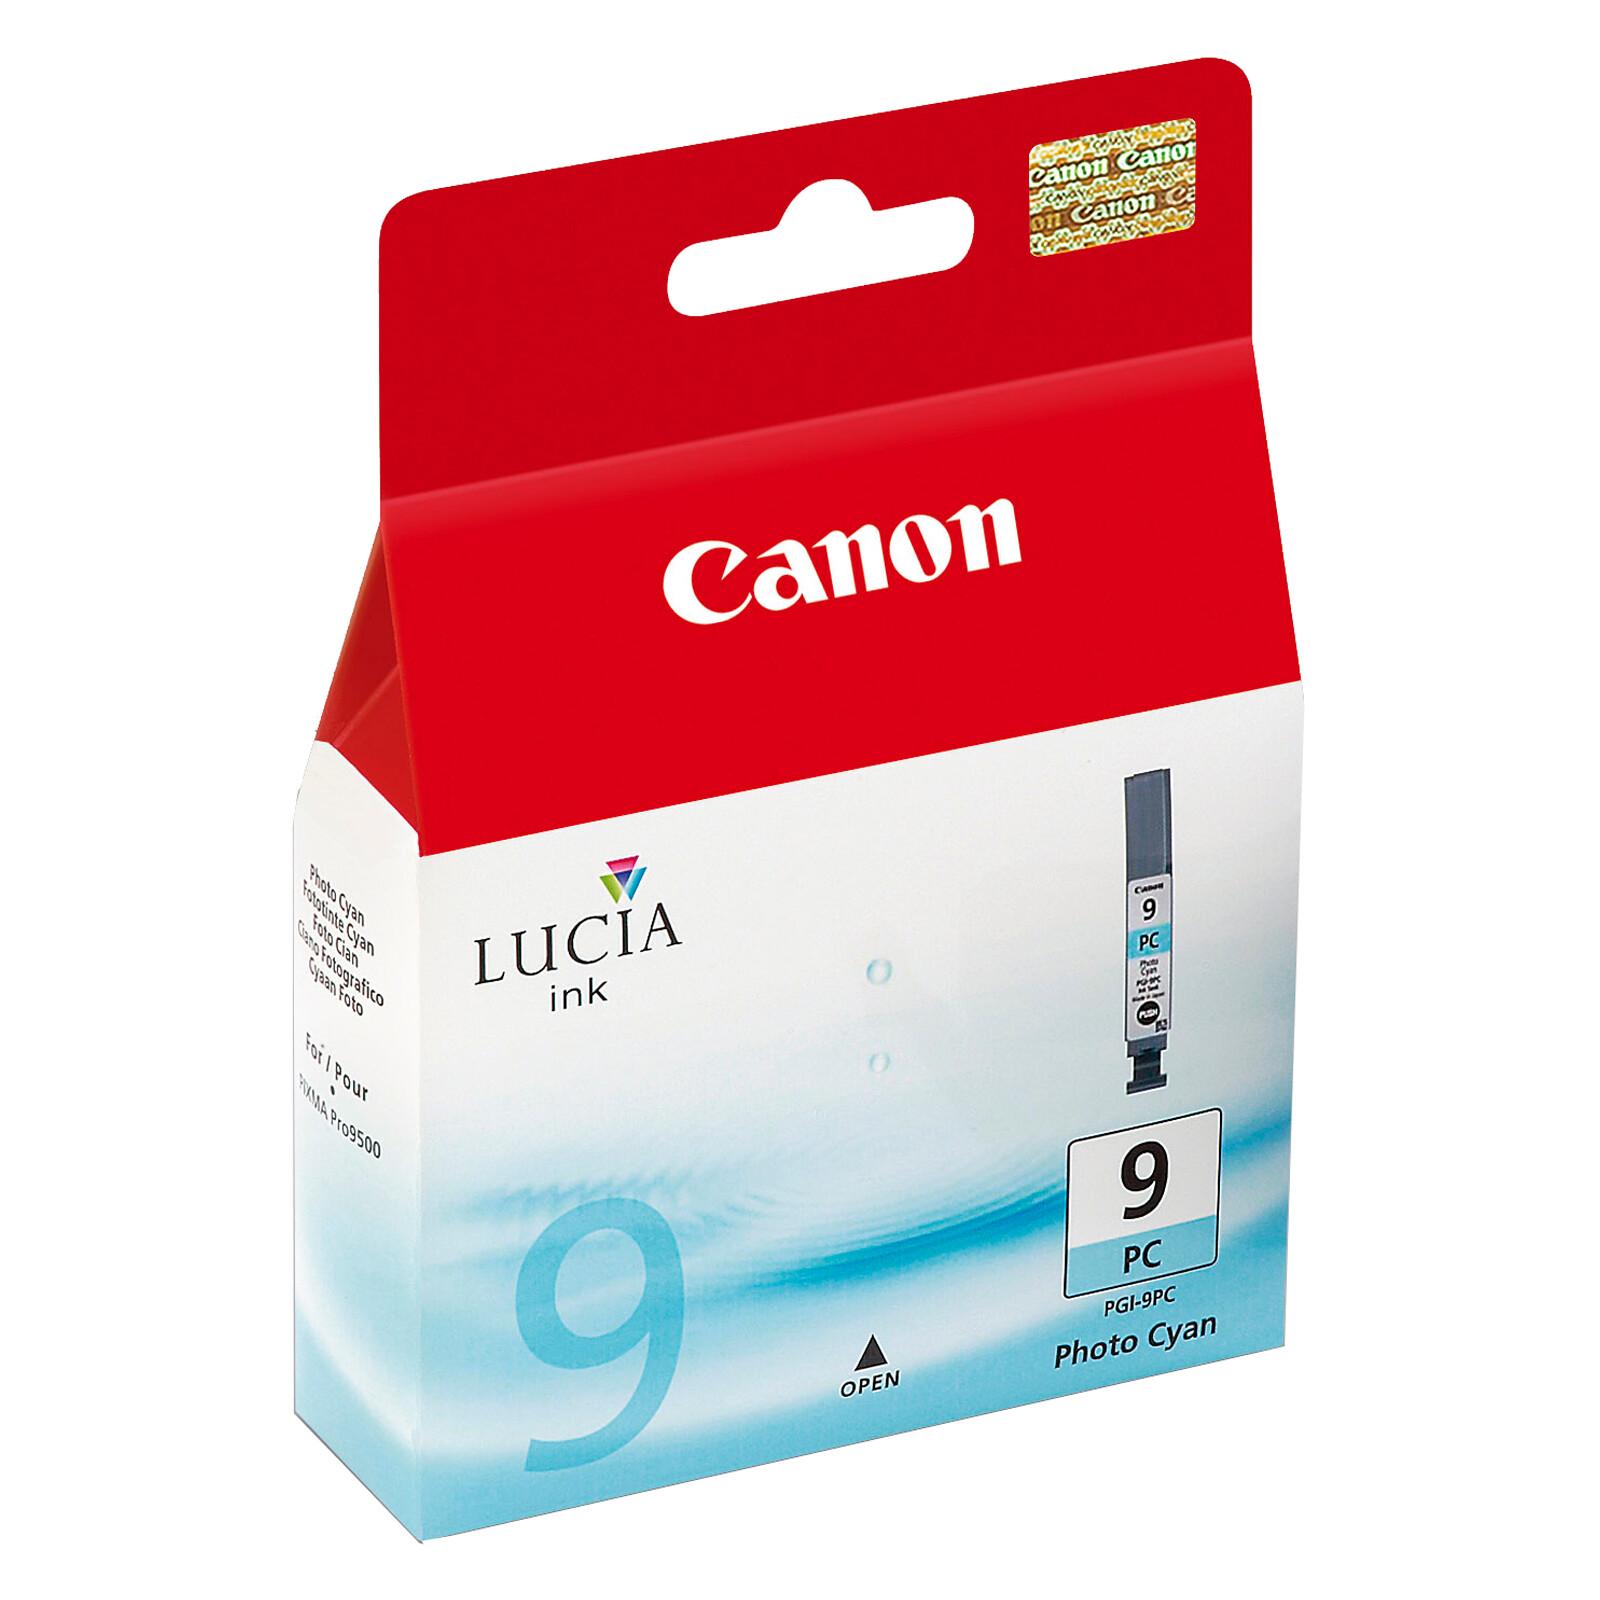 Canon PGI-9PC Photo cyan 14ml